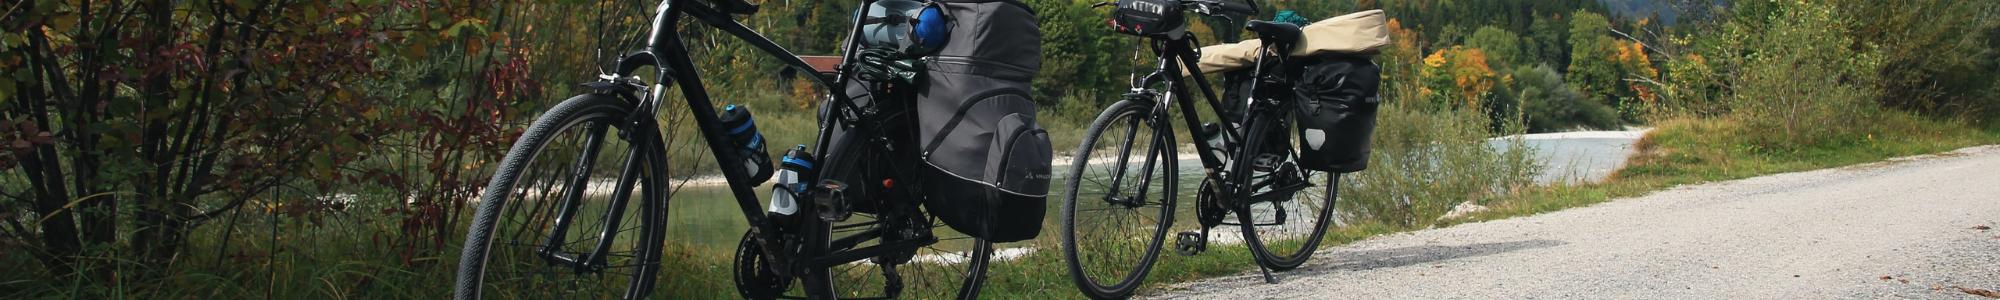 Cyclotourisme salon du vélo Dijon